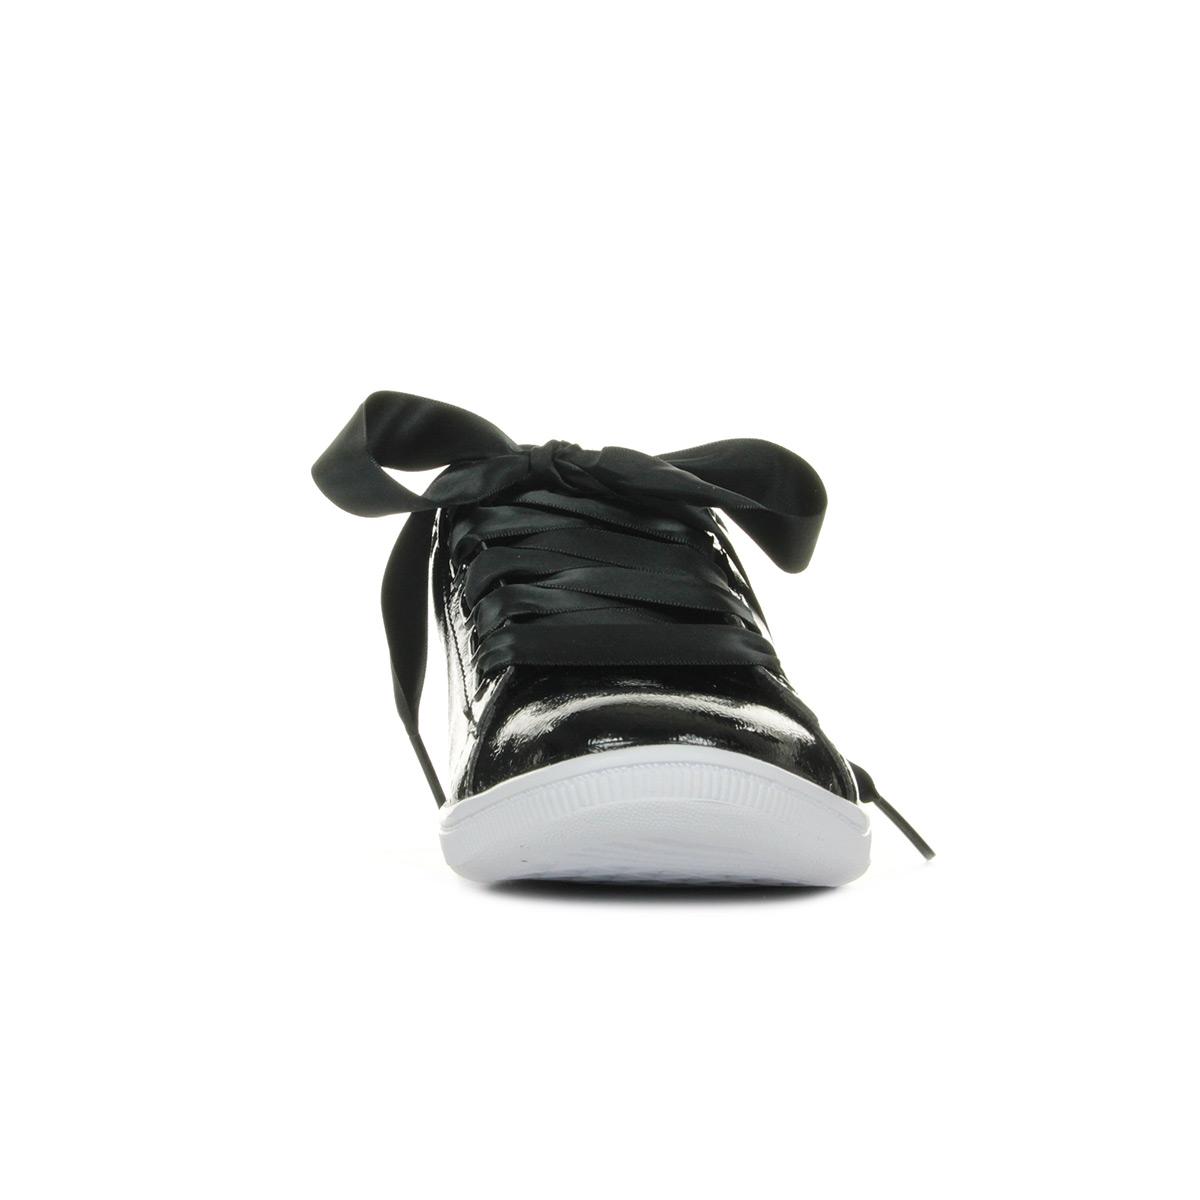 Puma Vikky Ribbon Patent 36641701, Baskets mode femme